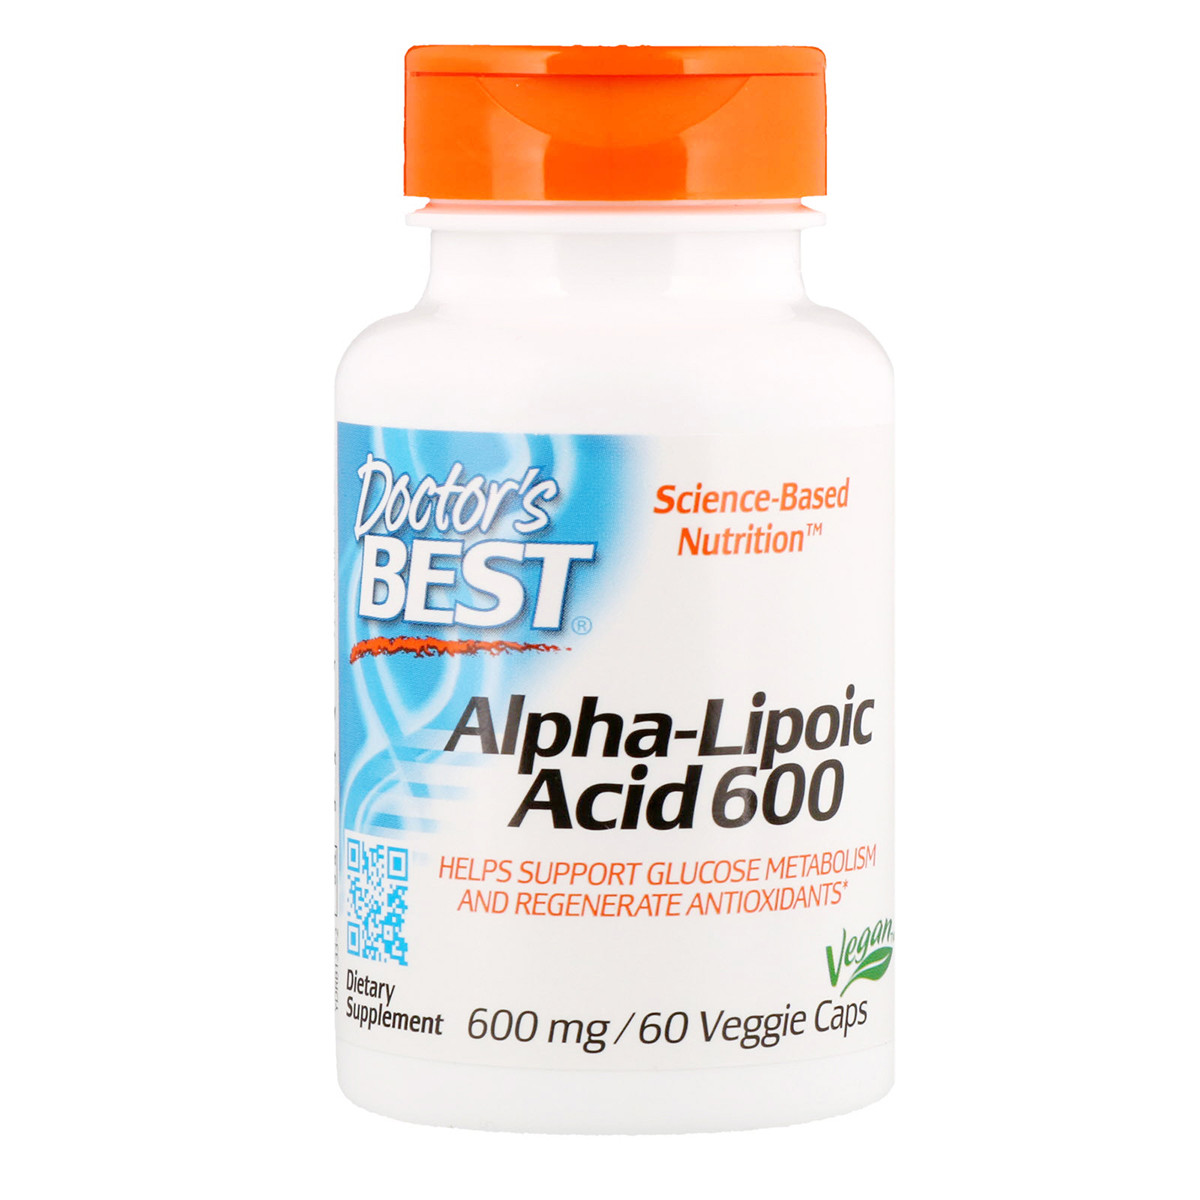 Альфа-липоевая кислота, Doctor's Best, Alpha-Lipoic Acid, 600 мг, 60 капсул